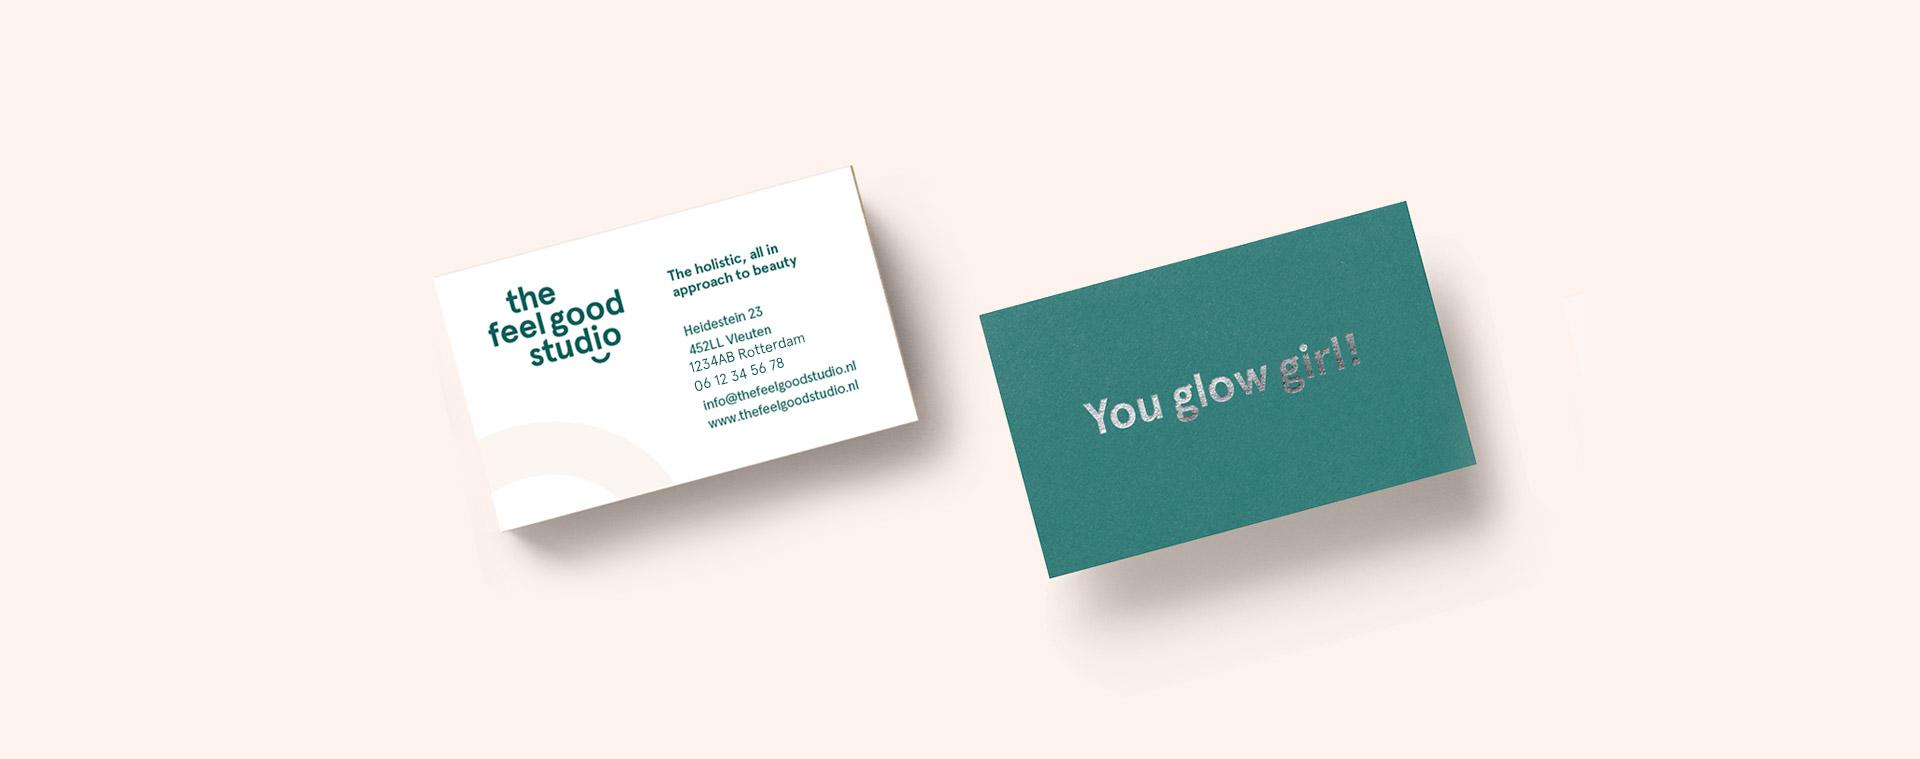 3gfeelgood_massage_studio_identity_businesscard_leconcepteur_tamarapruis